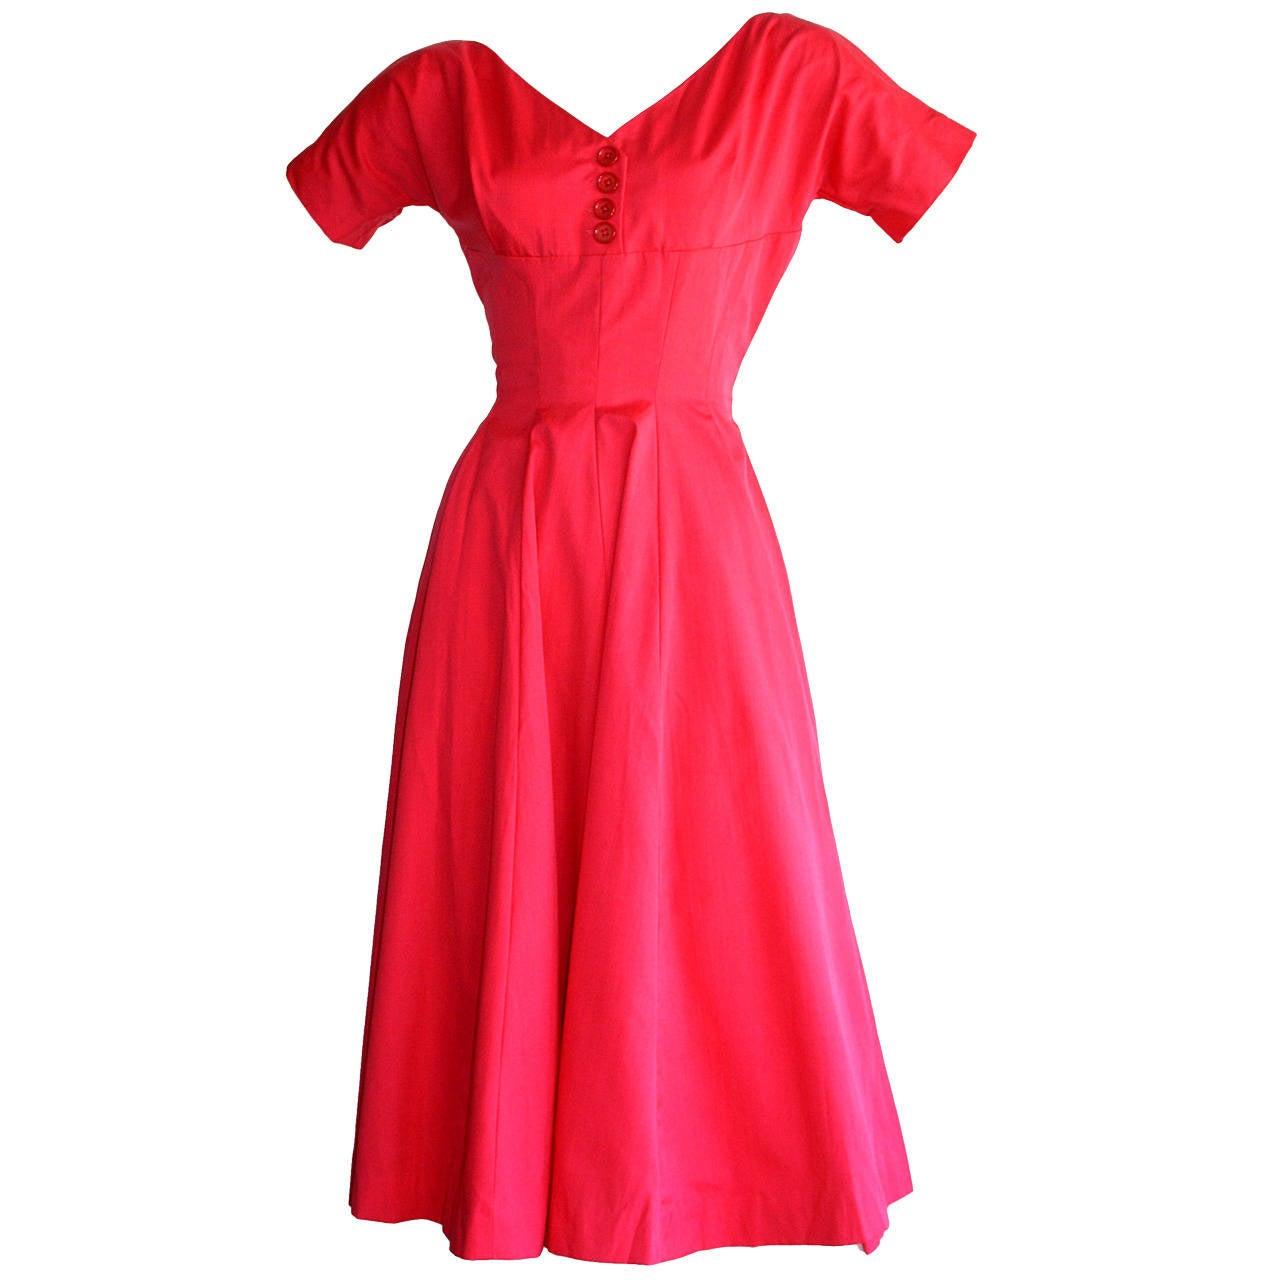 Pretty 1950s Vintage Anne Fogarty Raspberry Pink Full Skirt Button Dress